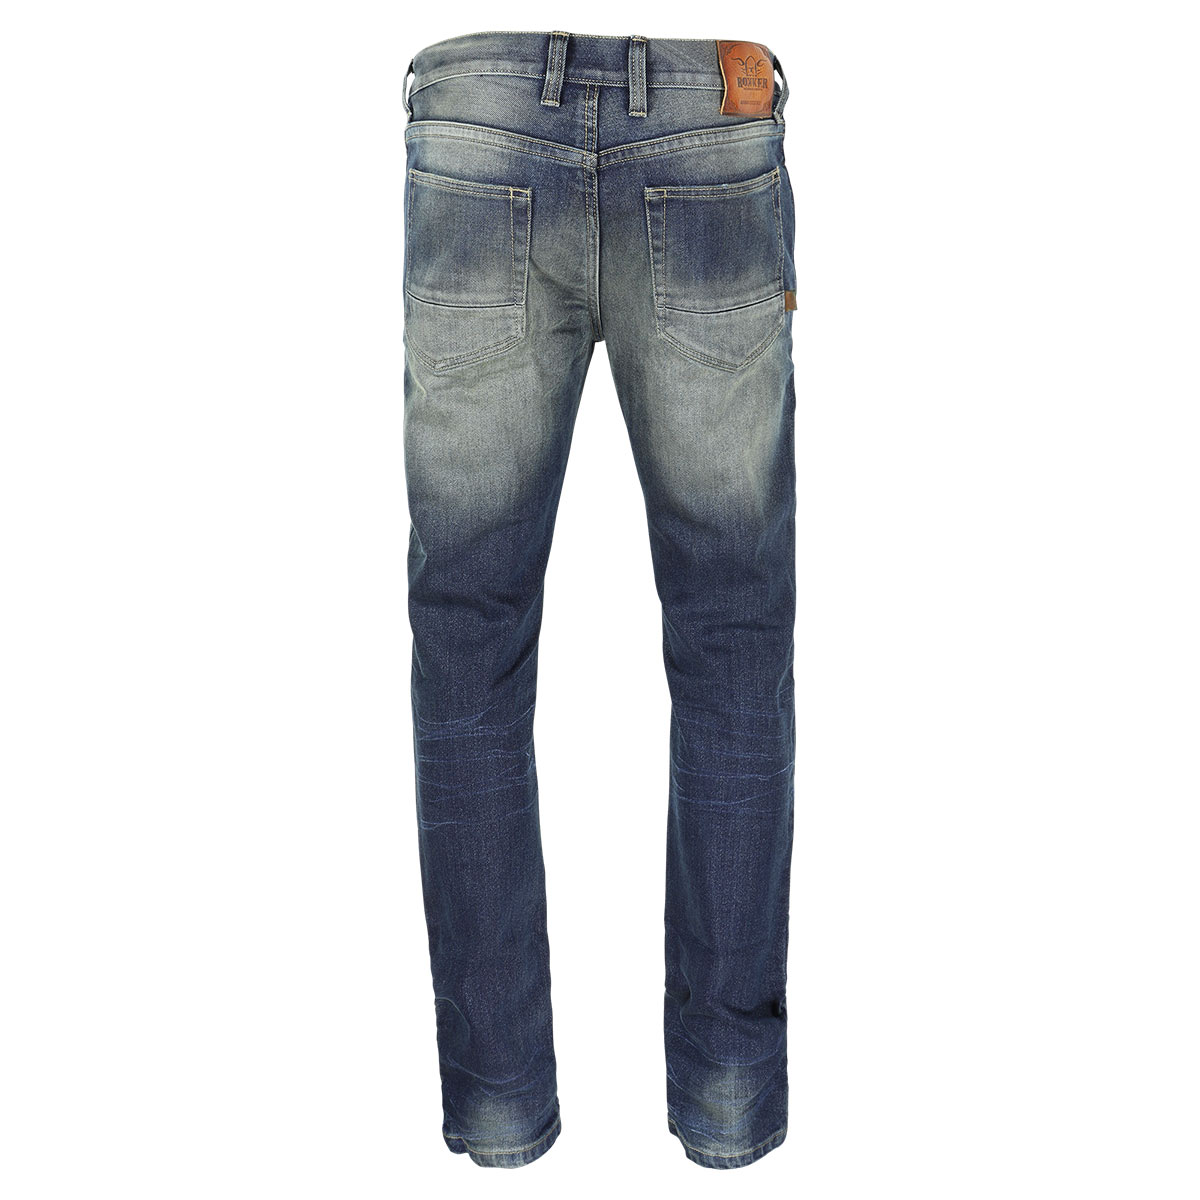 Rokker Rokkertech Straight Vintage Jeans